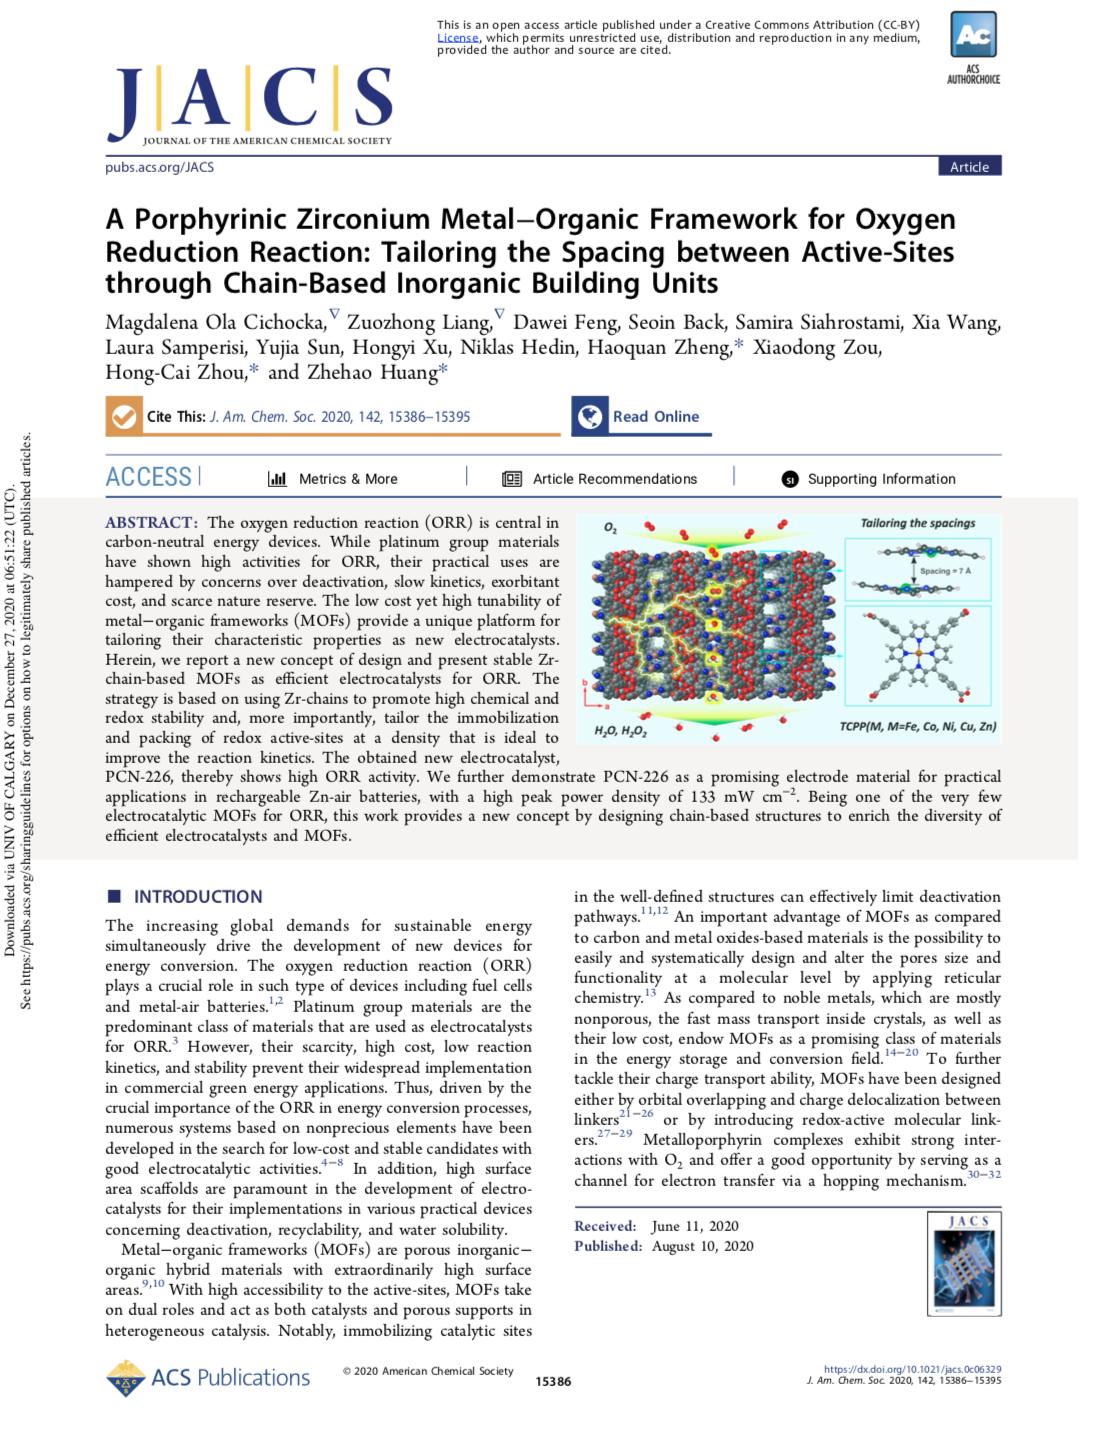 A Porphyrinic Zirconium Metal−Organic Framework for Oxygen Reduction Reaction: Tailoring the Spacing